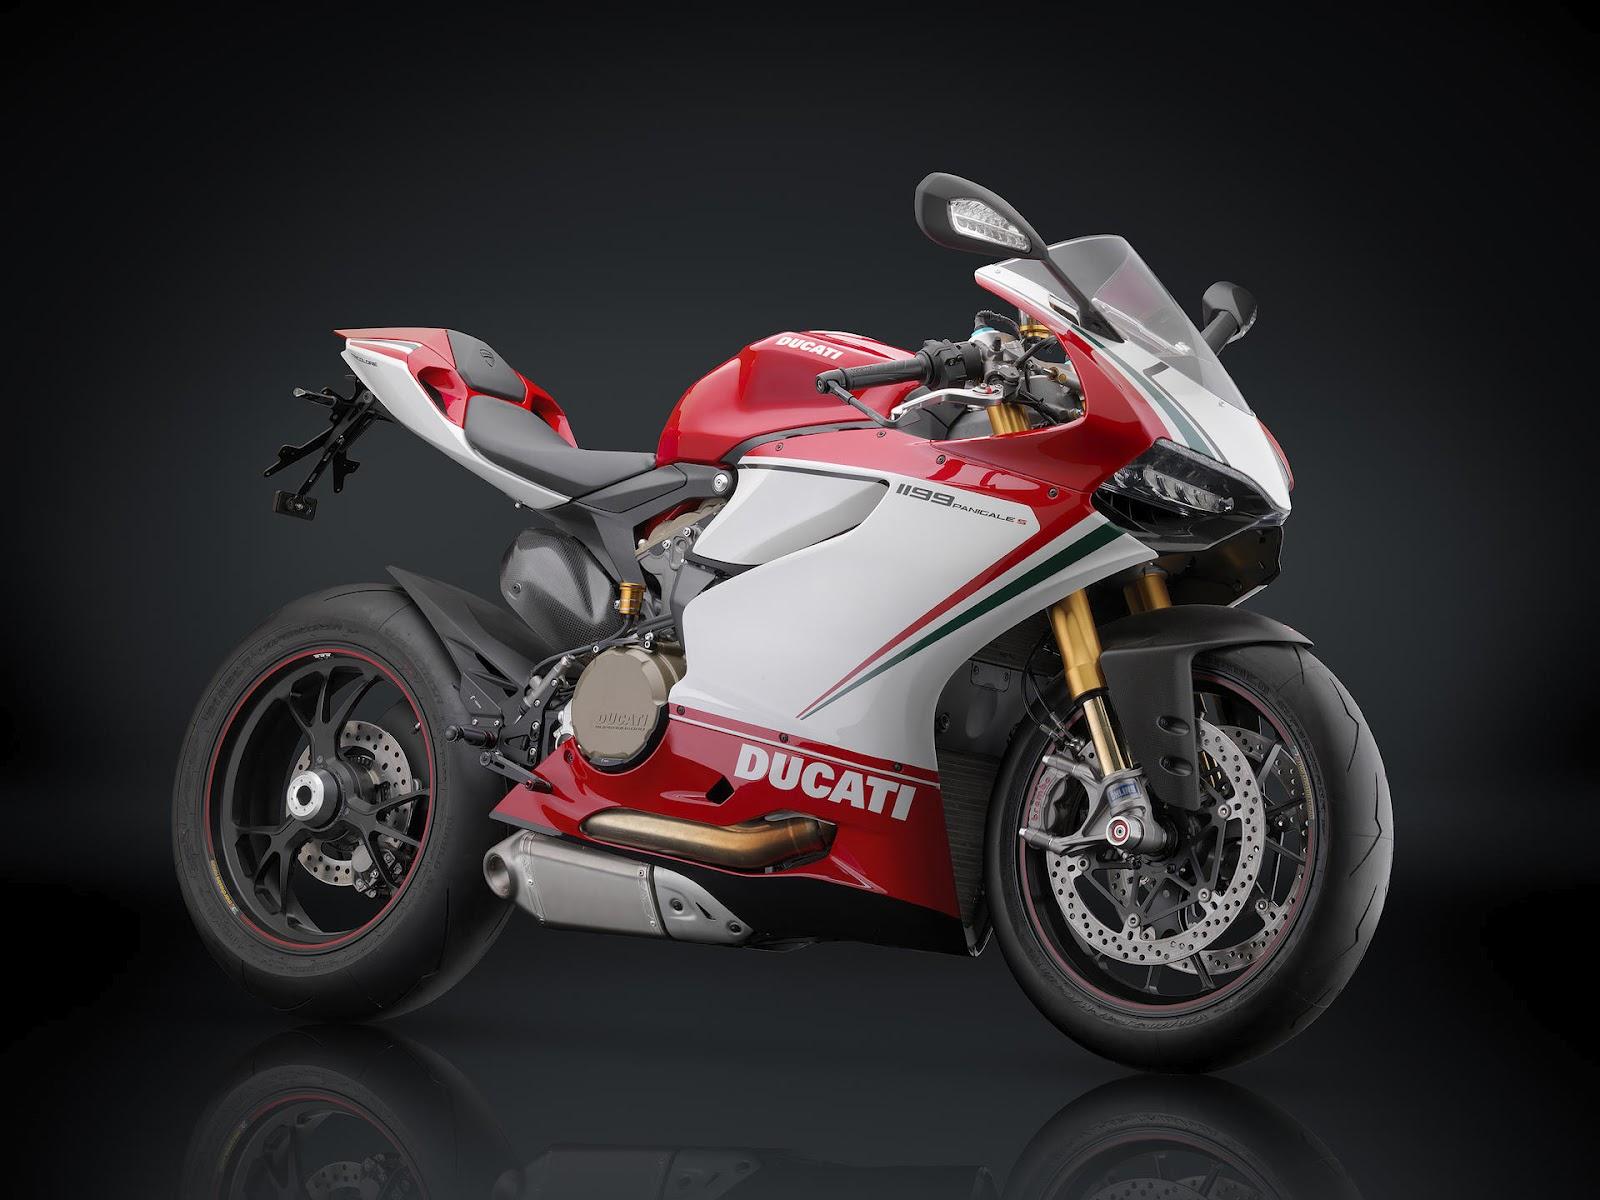 Ducati Gts Parts